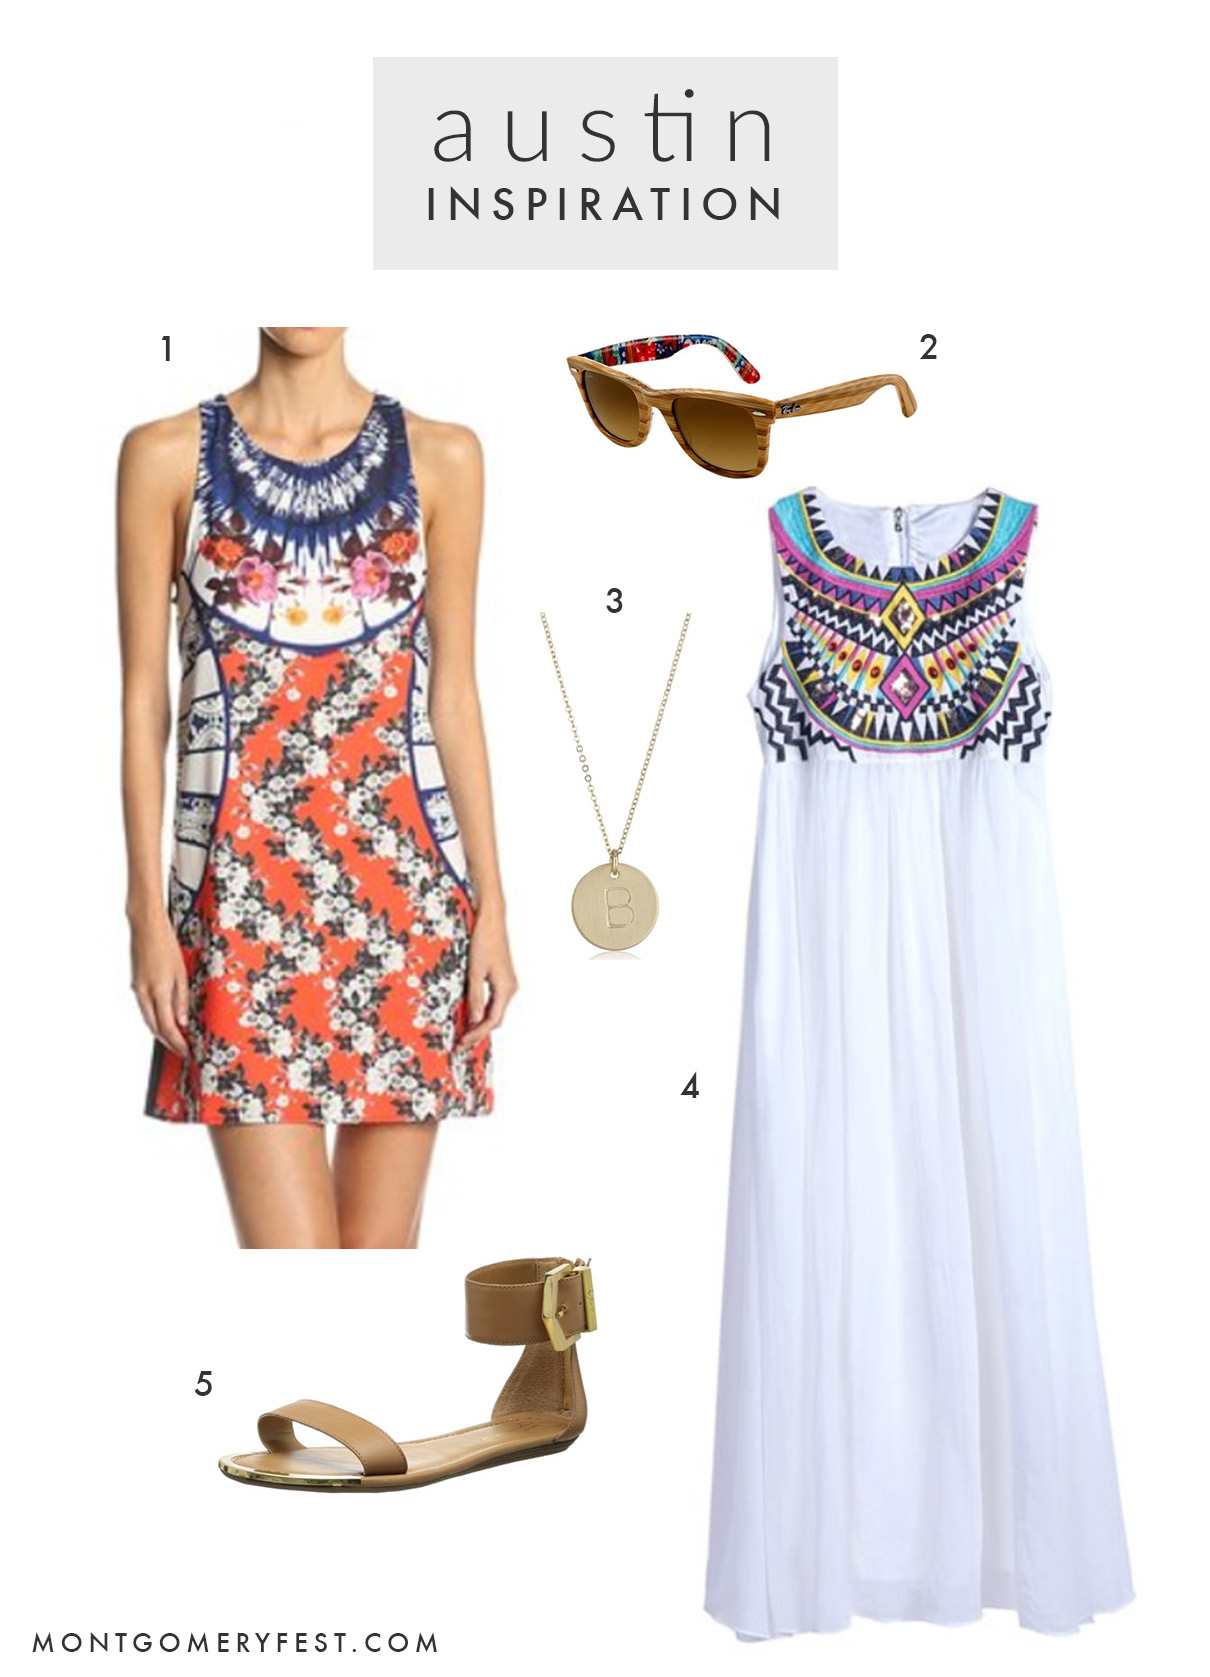 Austin-Outfit-Details.jpg